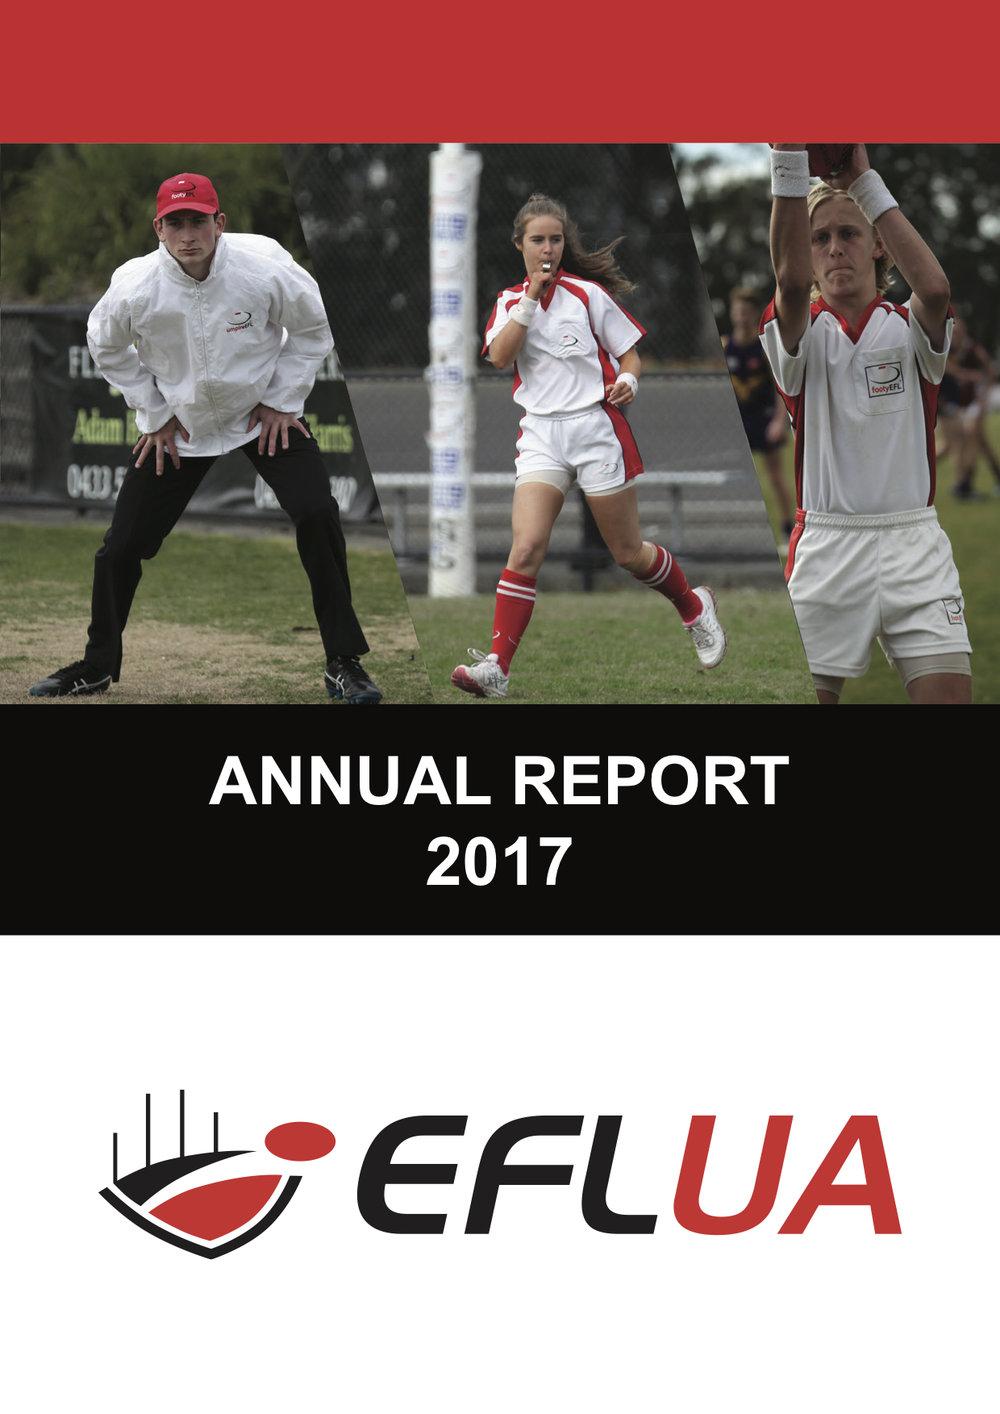 2017 Annual Report IMAGE.jpg